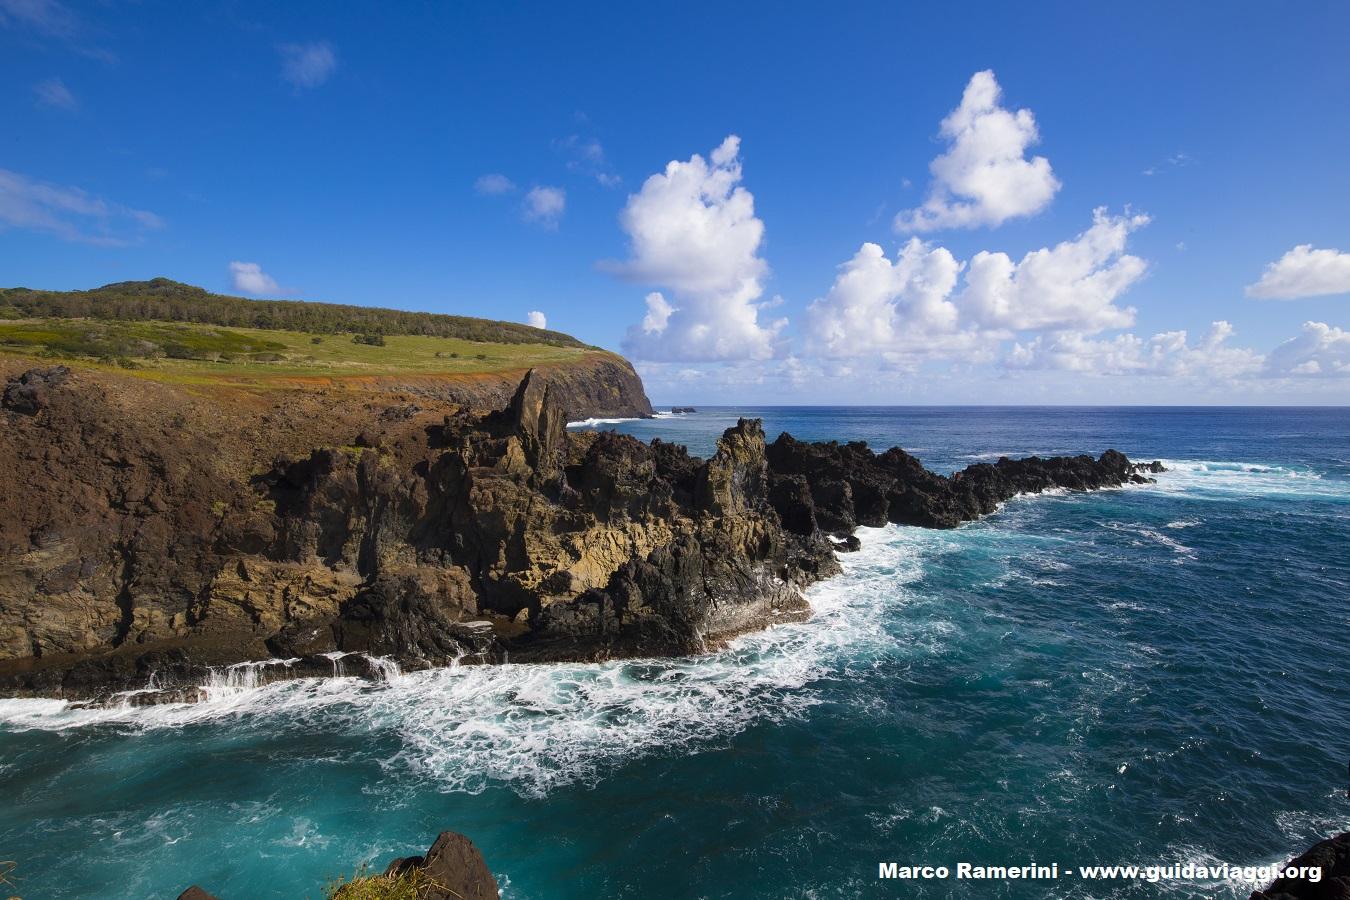 Ana Kai Tangata, Isla de Pascua, Chile. Autor y Copyright Marco Ramerini